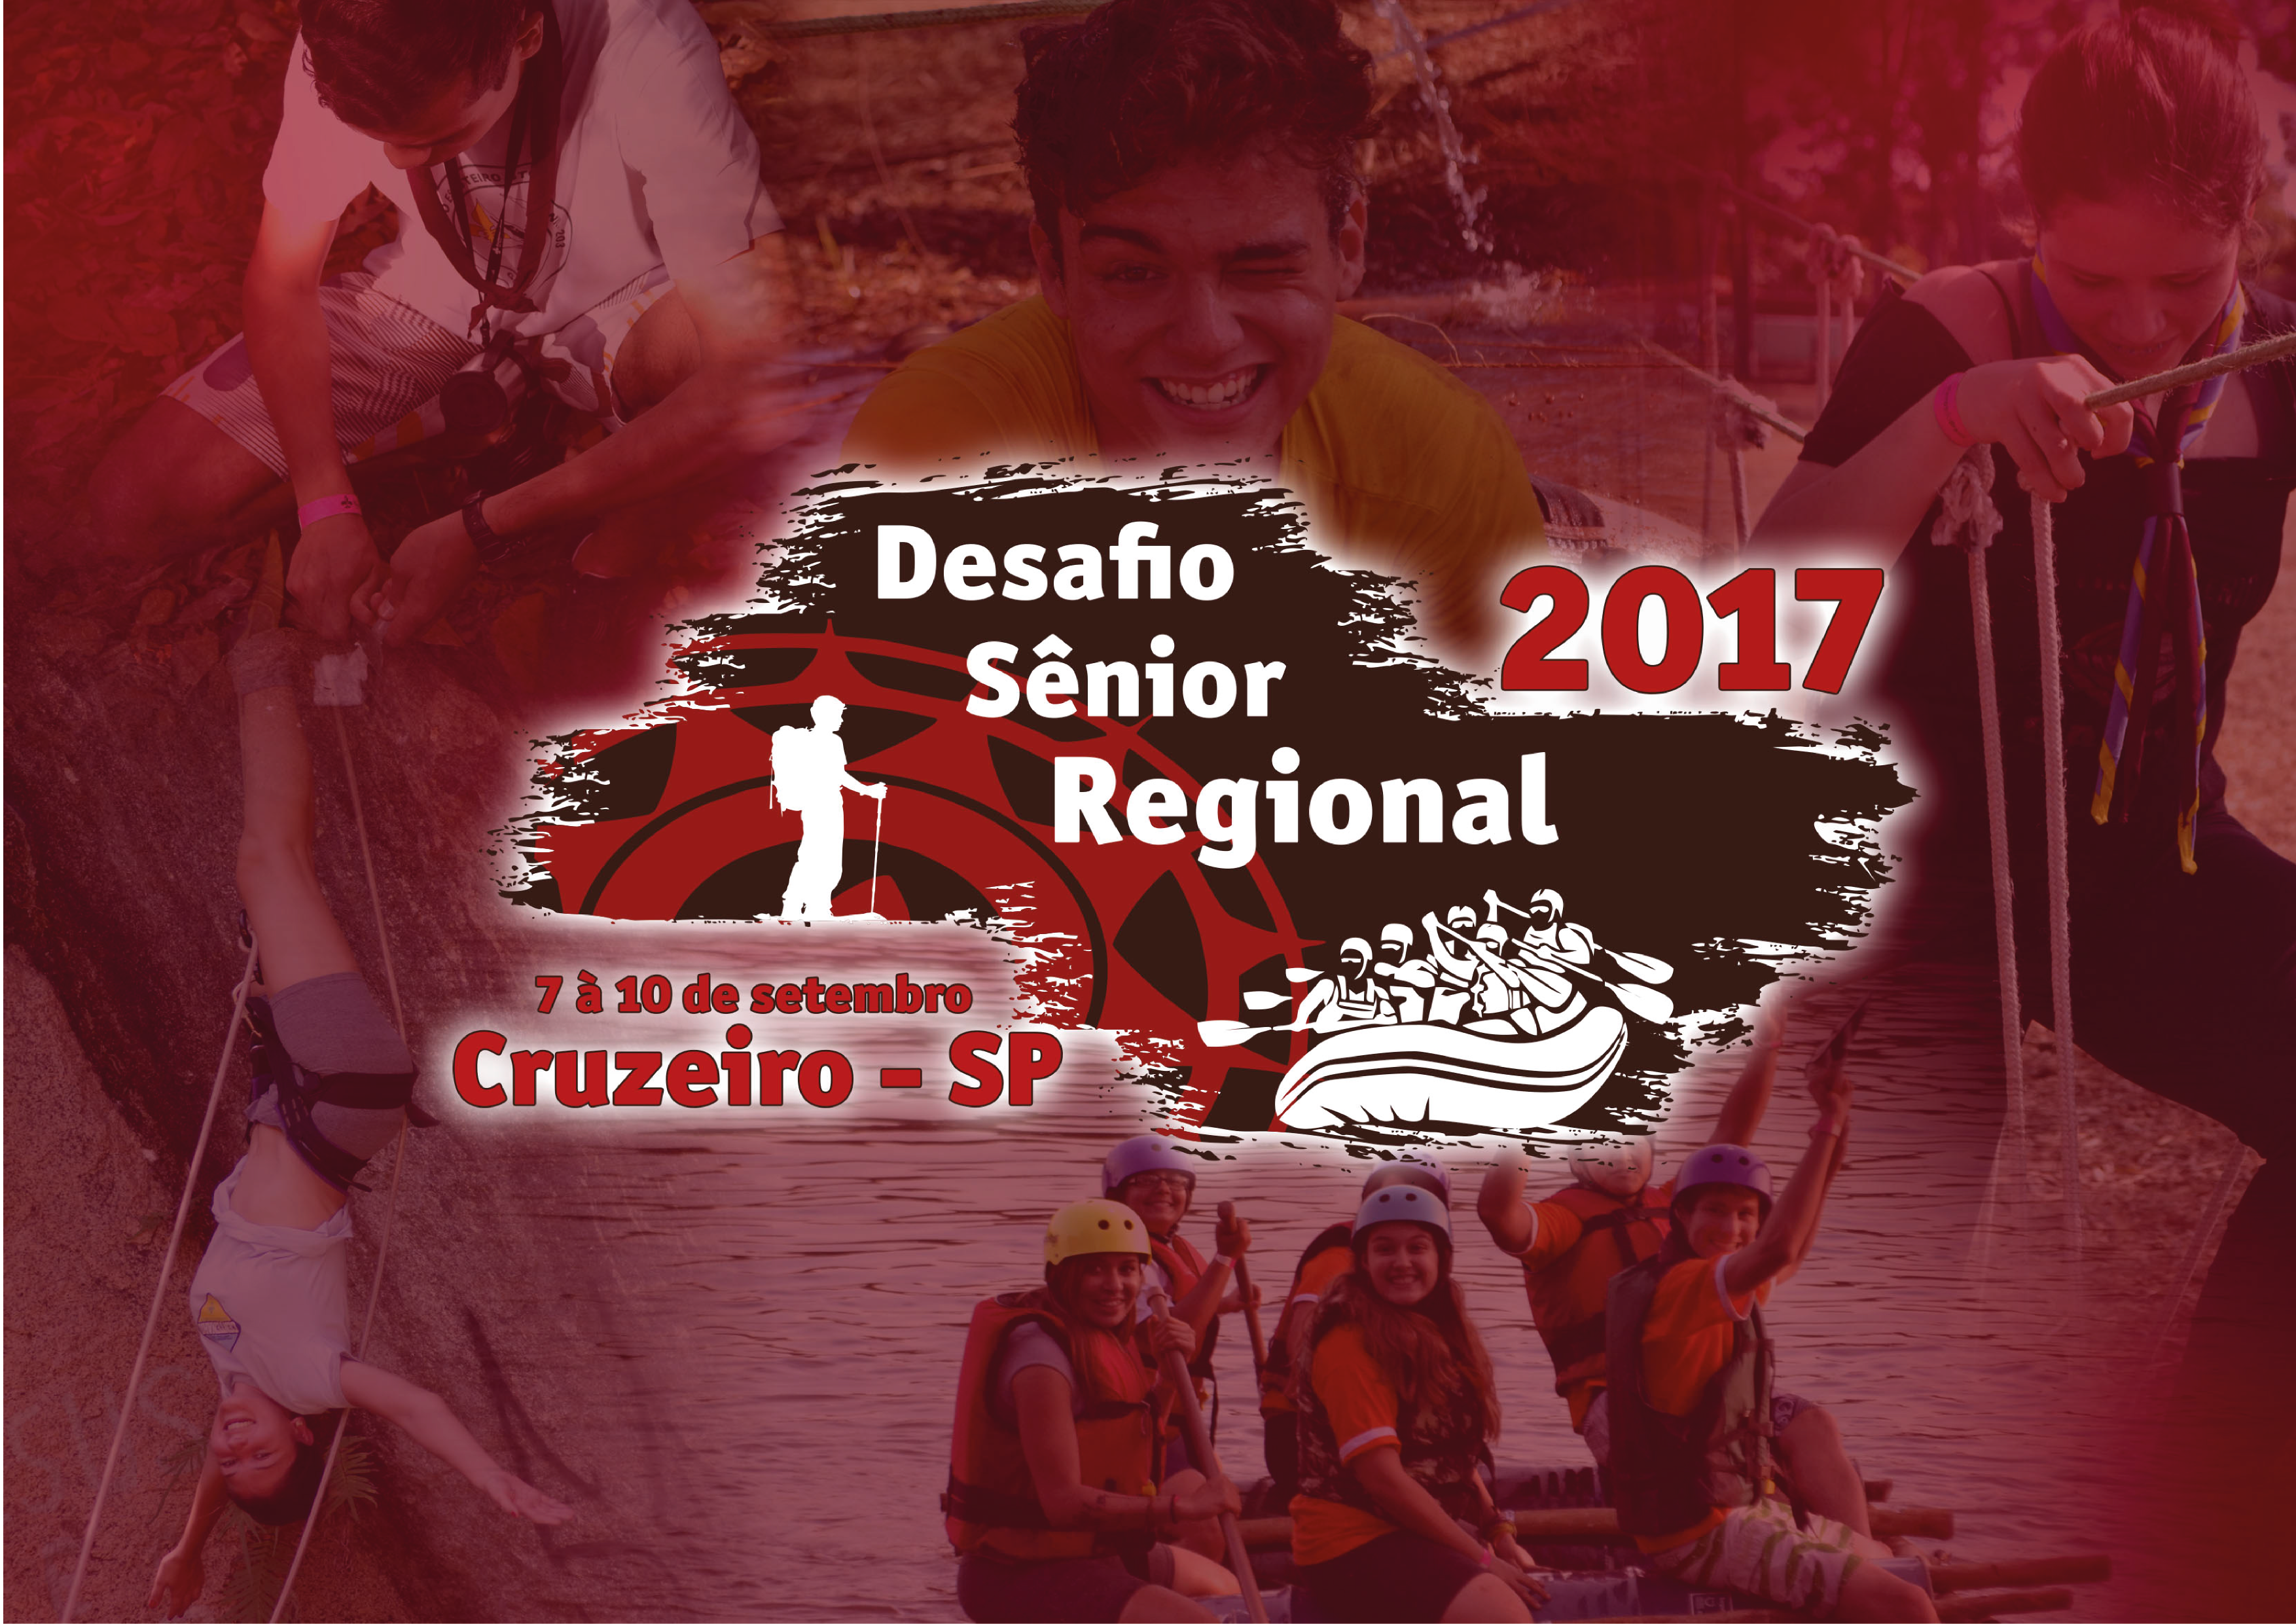 Desafio Sênior Regional 2017